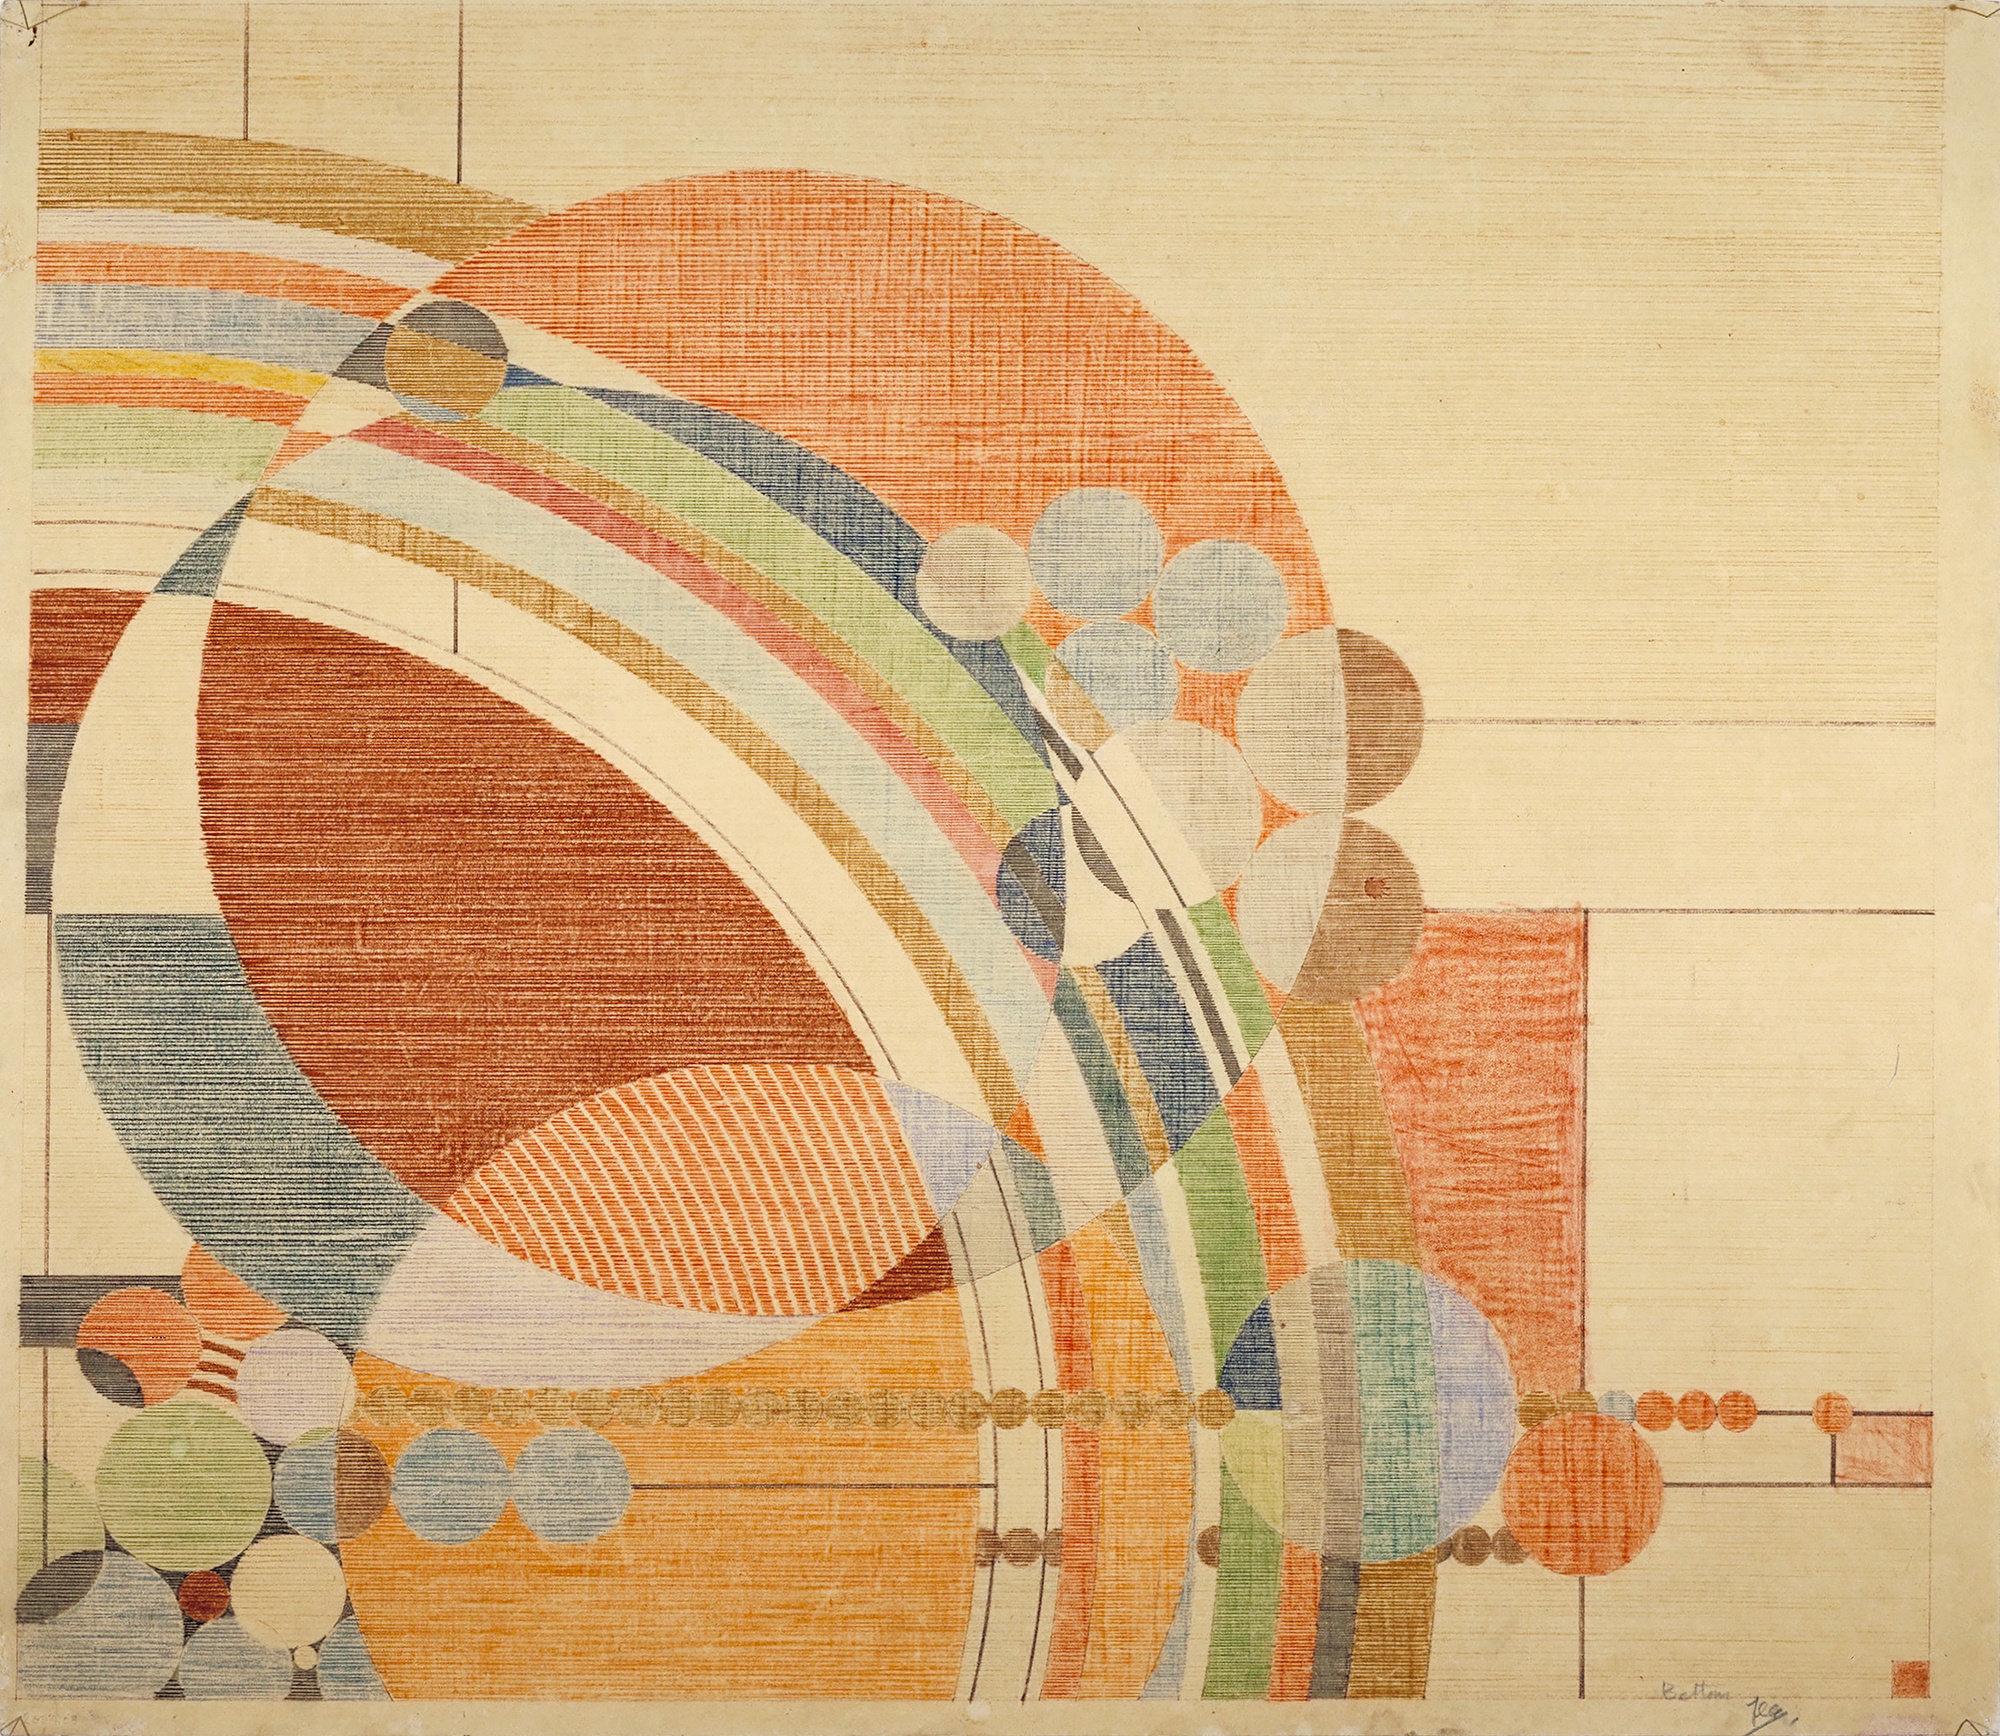 Frank Lloyd Wright. Portada de Magazine, 1926. The Museum of Modern Art | Avery Architectural & Fine Arts Library, Columbia University, New York